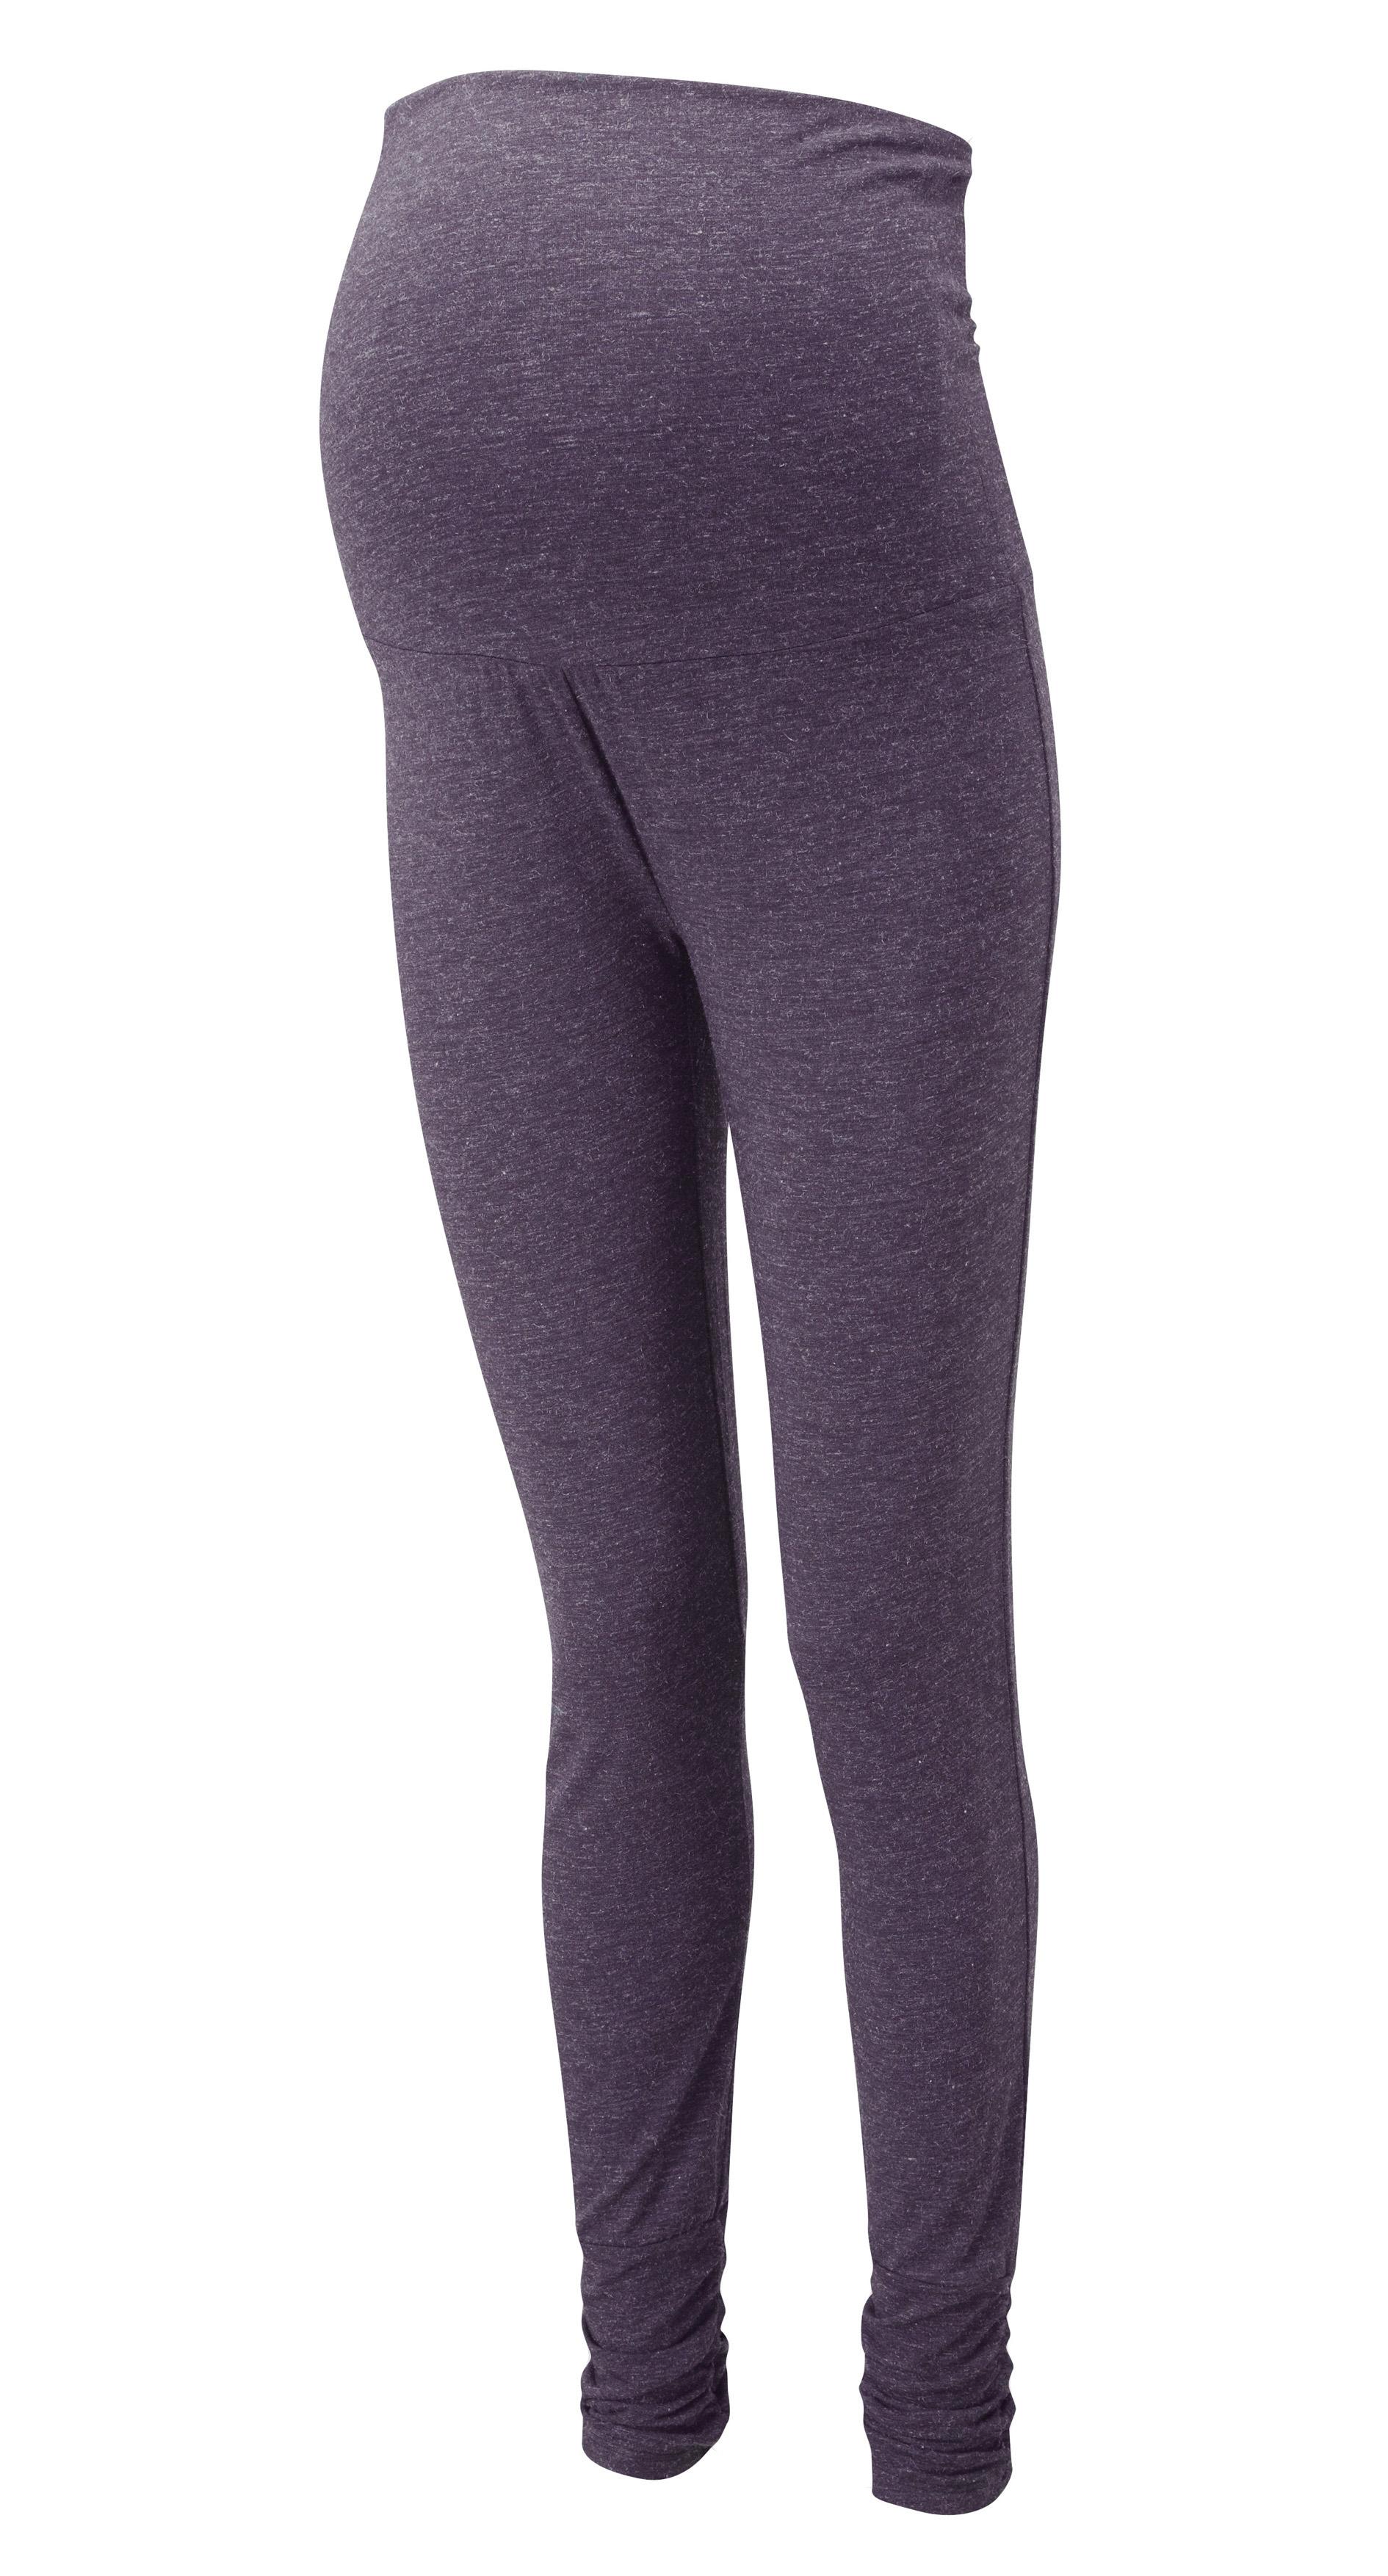 022-PJ34-12 | legging